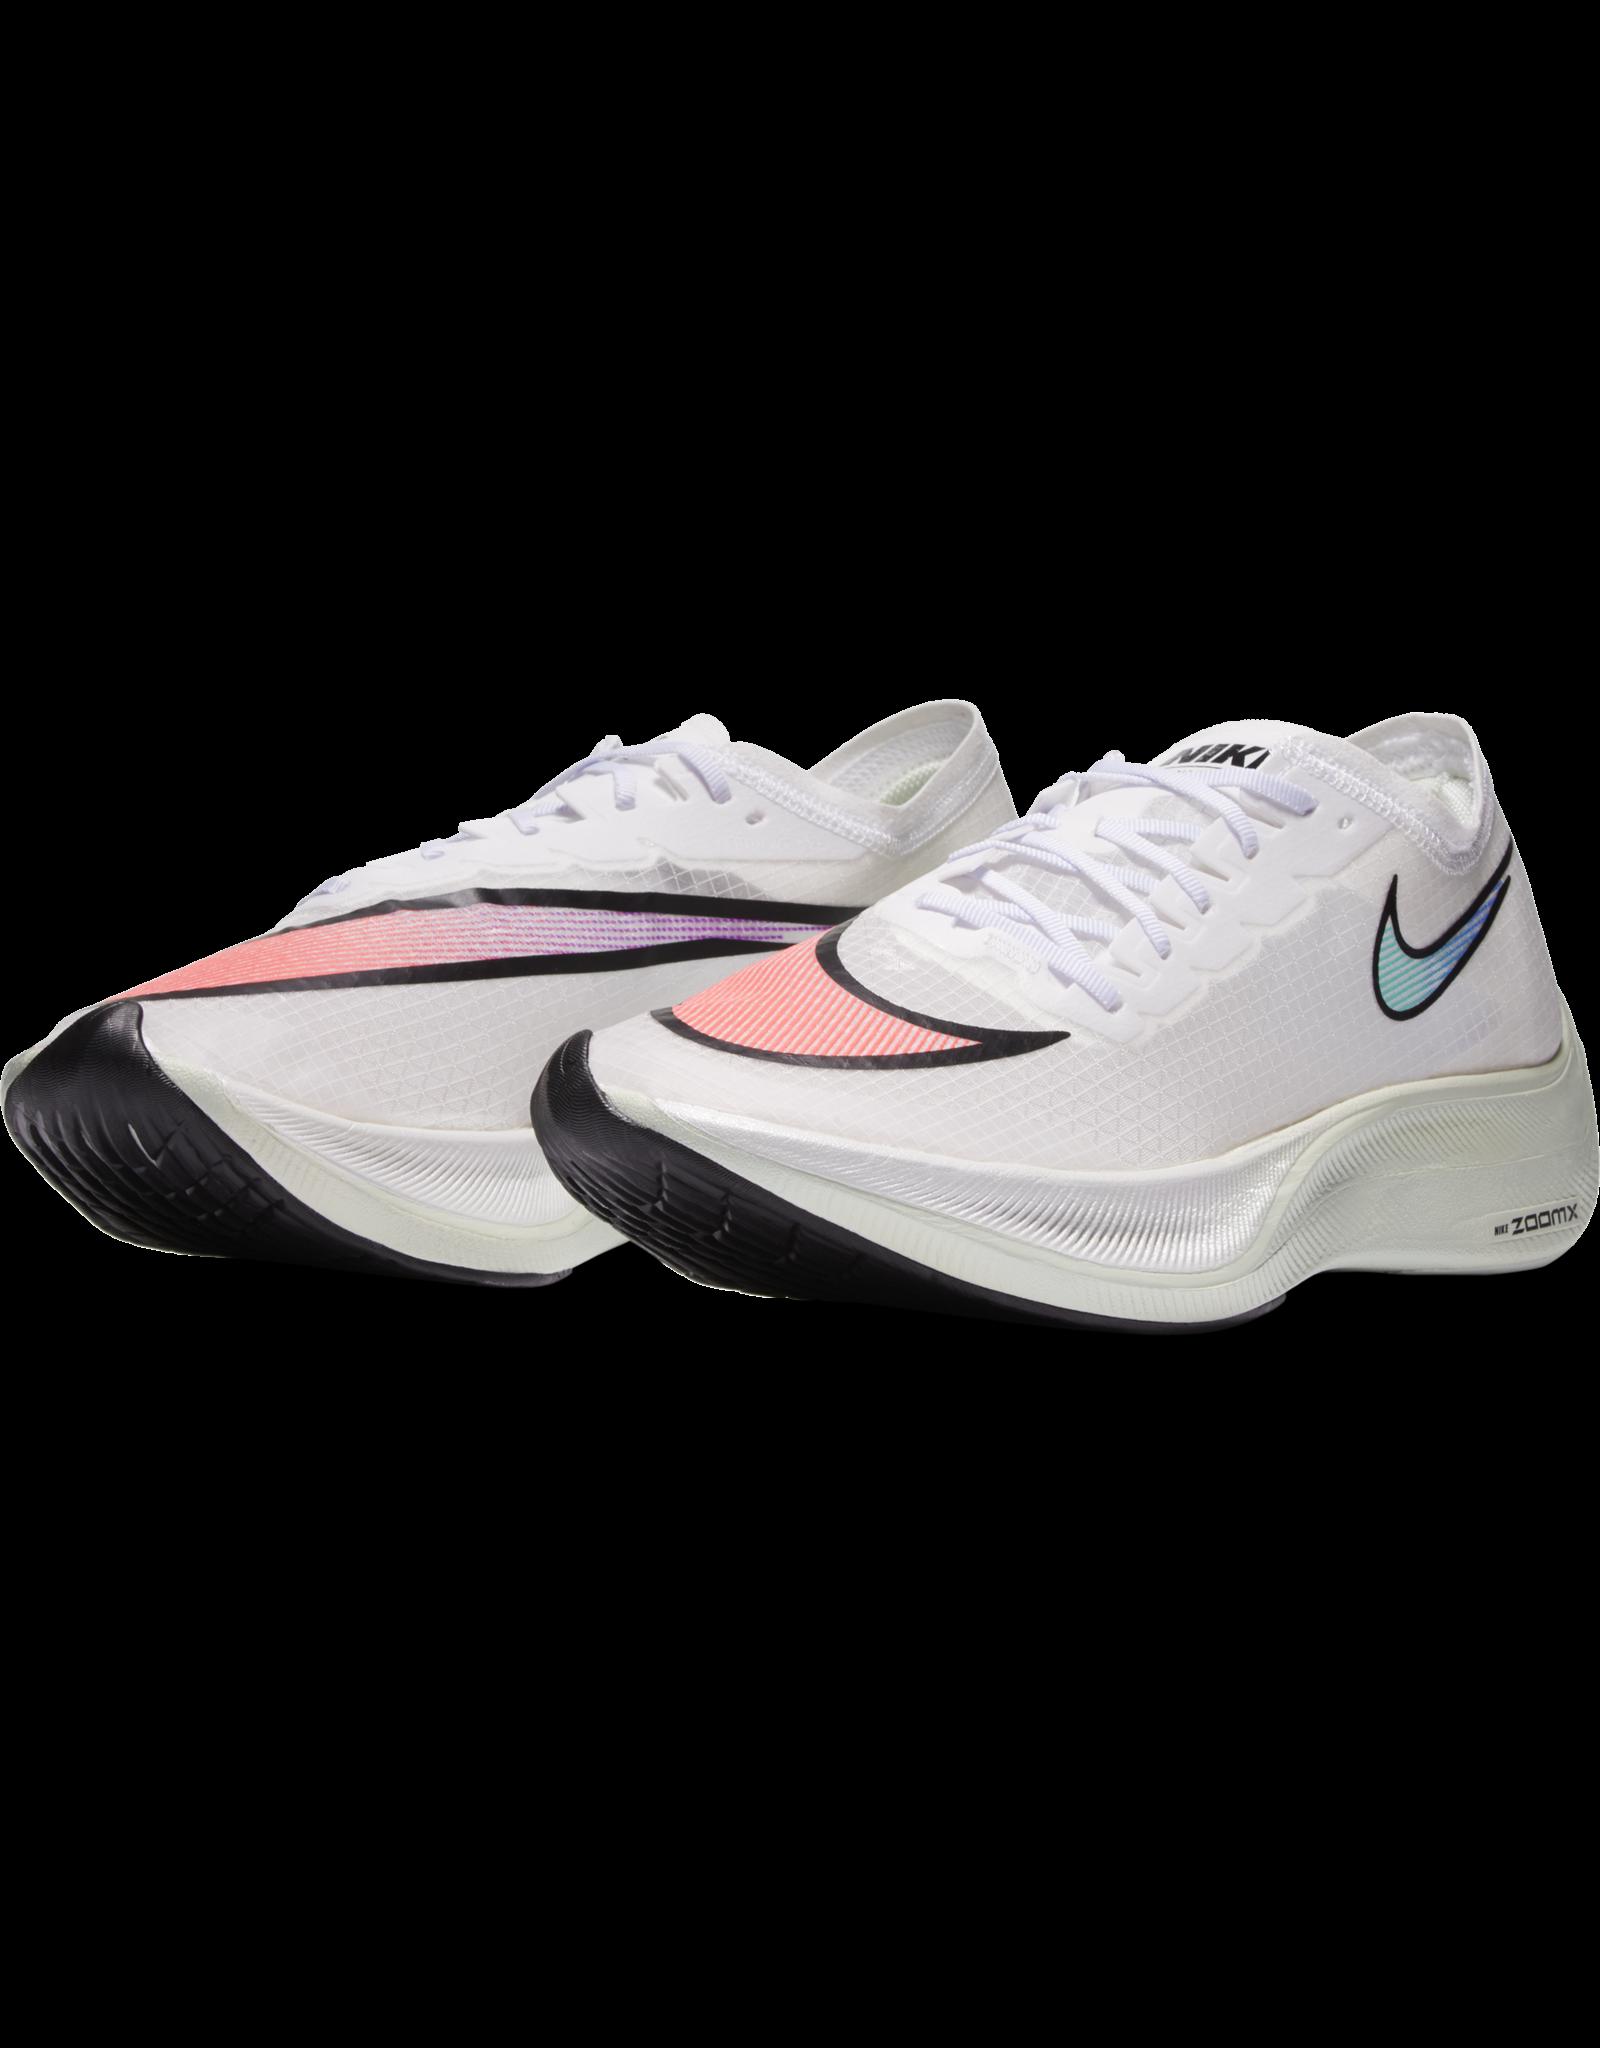 Nike Nike ZoomX Vaporfly Next% Olympic